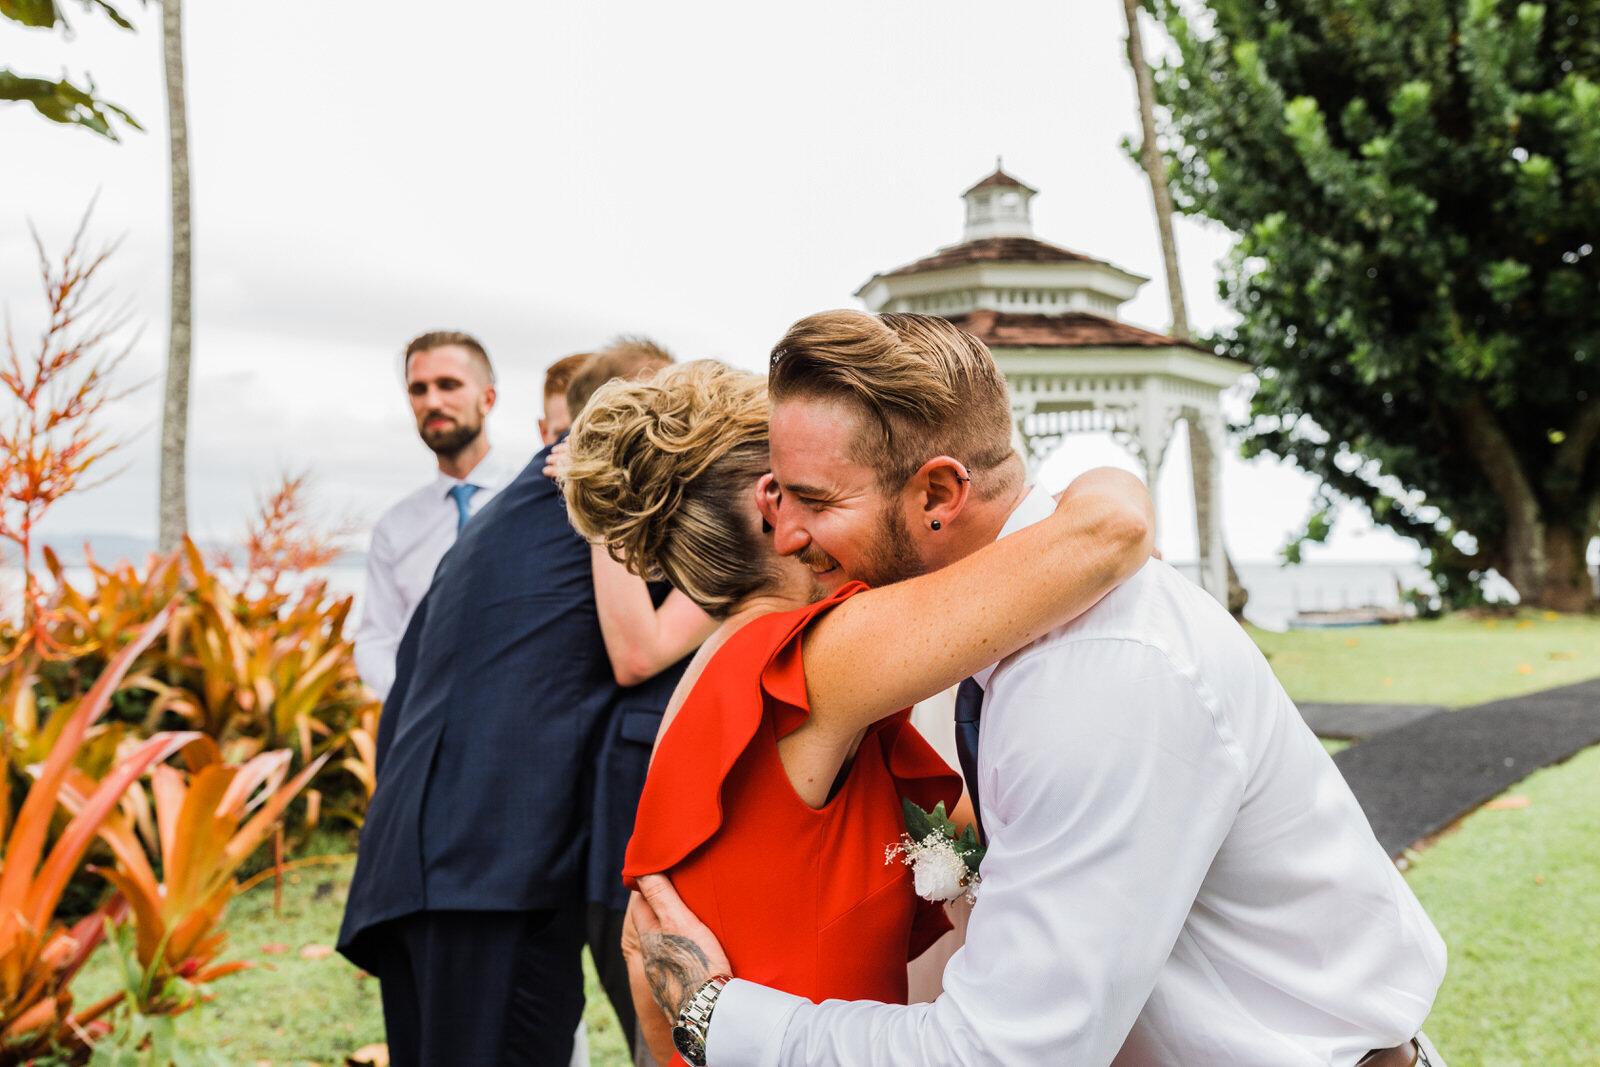 small-wedding-hawaii-destination-hilton-coconut-island-9848-1.jpg